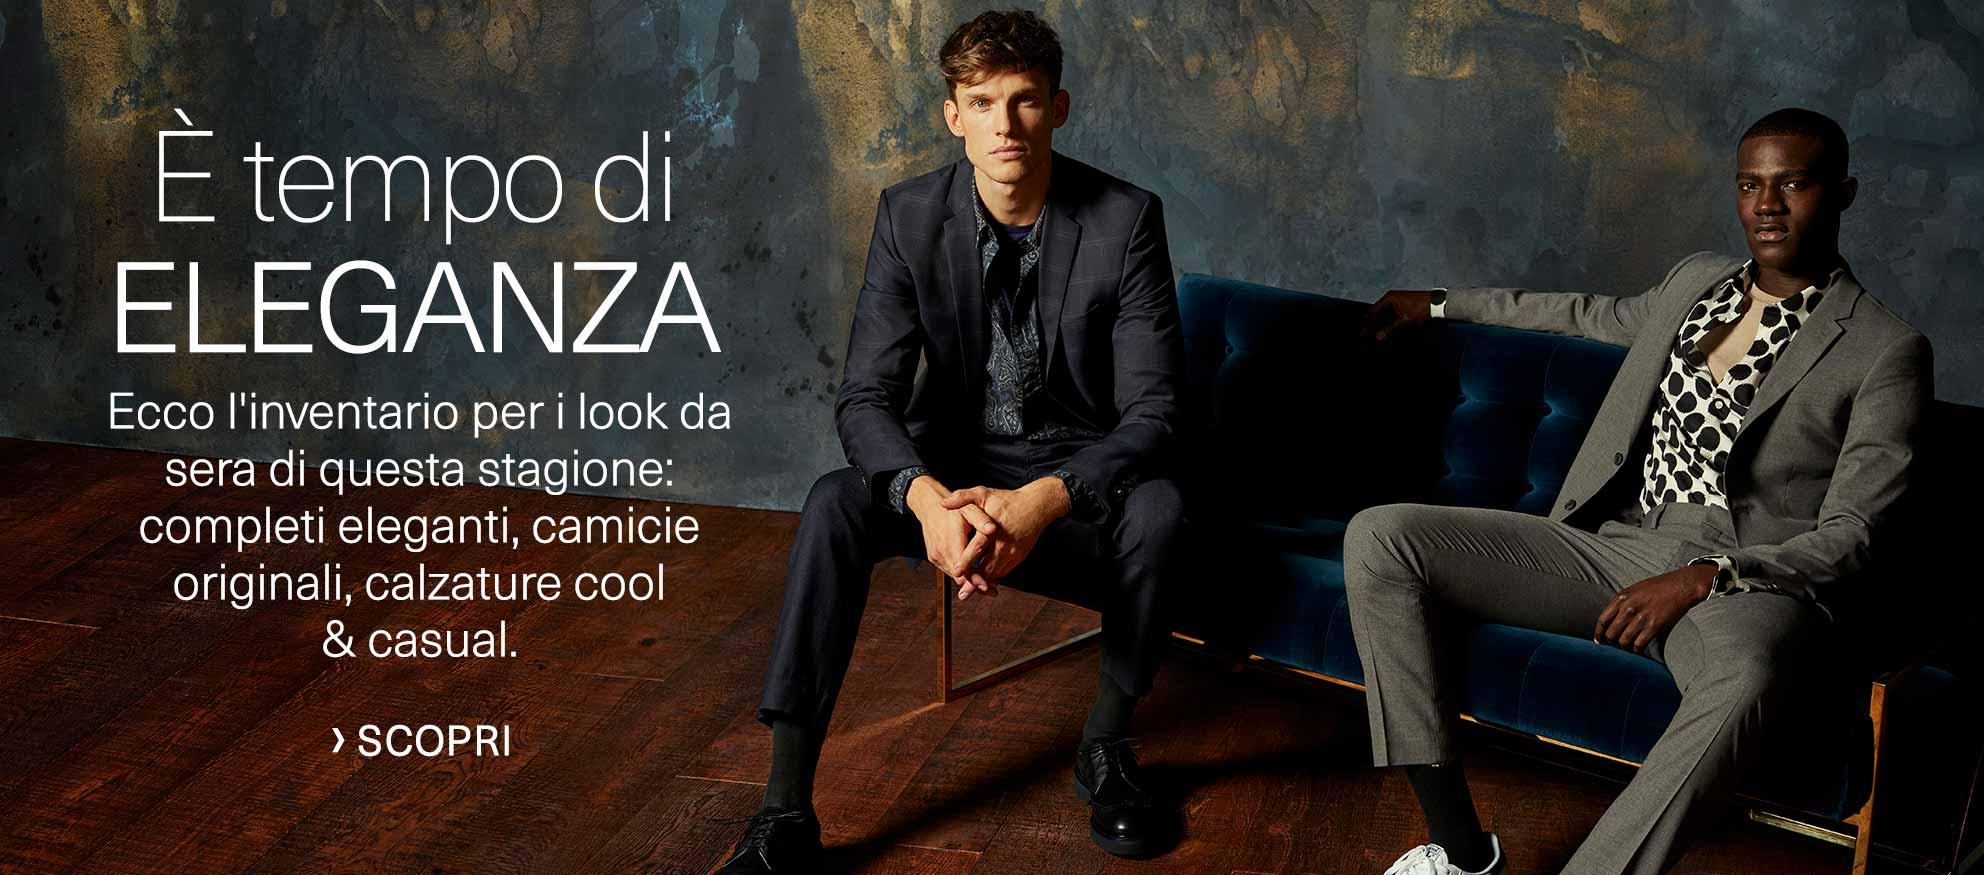 È tempo di eleganza. Ecco l'inventario per i look da sera di questa stagione: completi eleganti, camicie originali, calzature cool & casual.